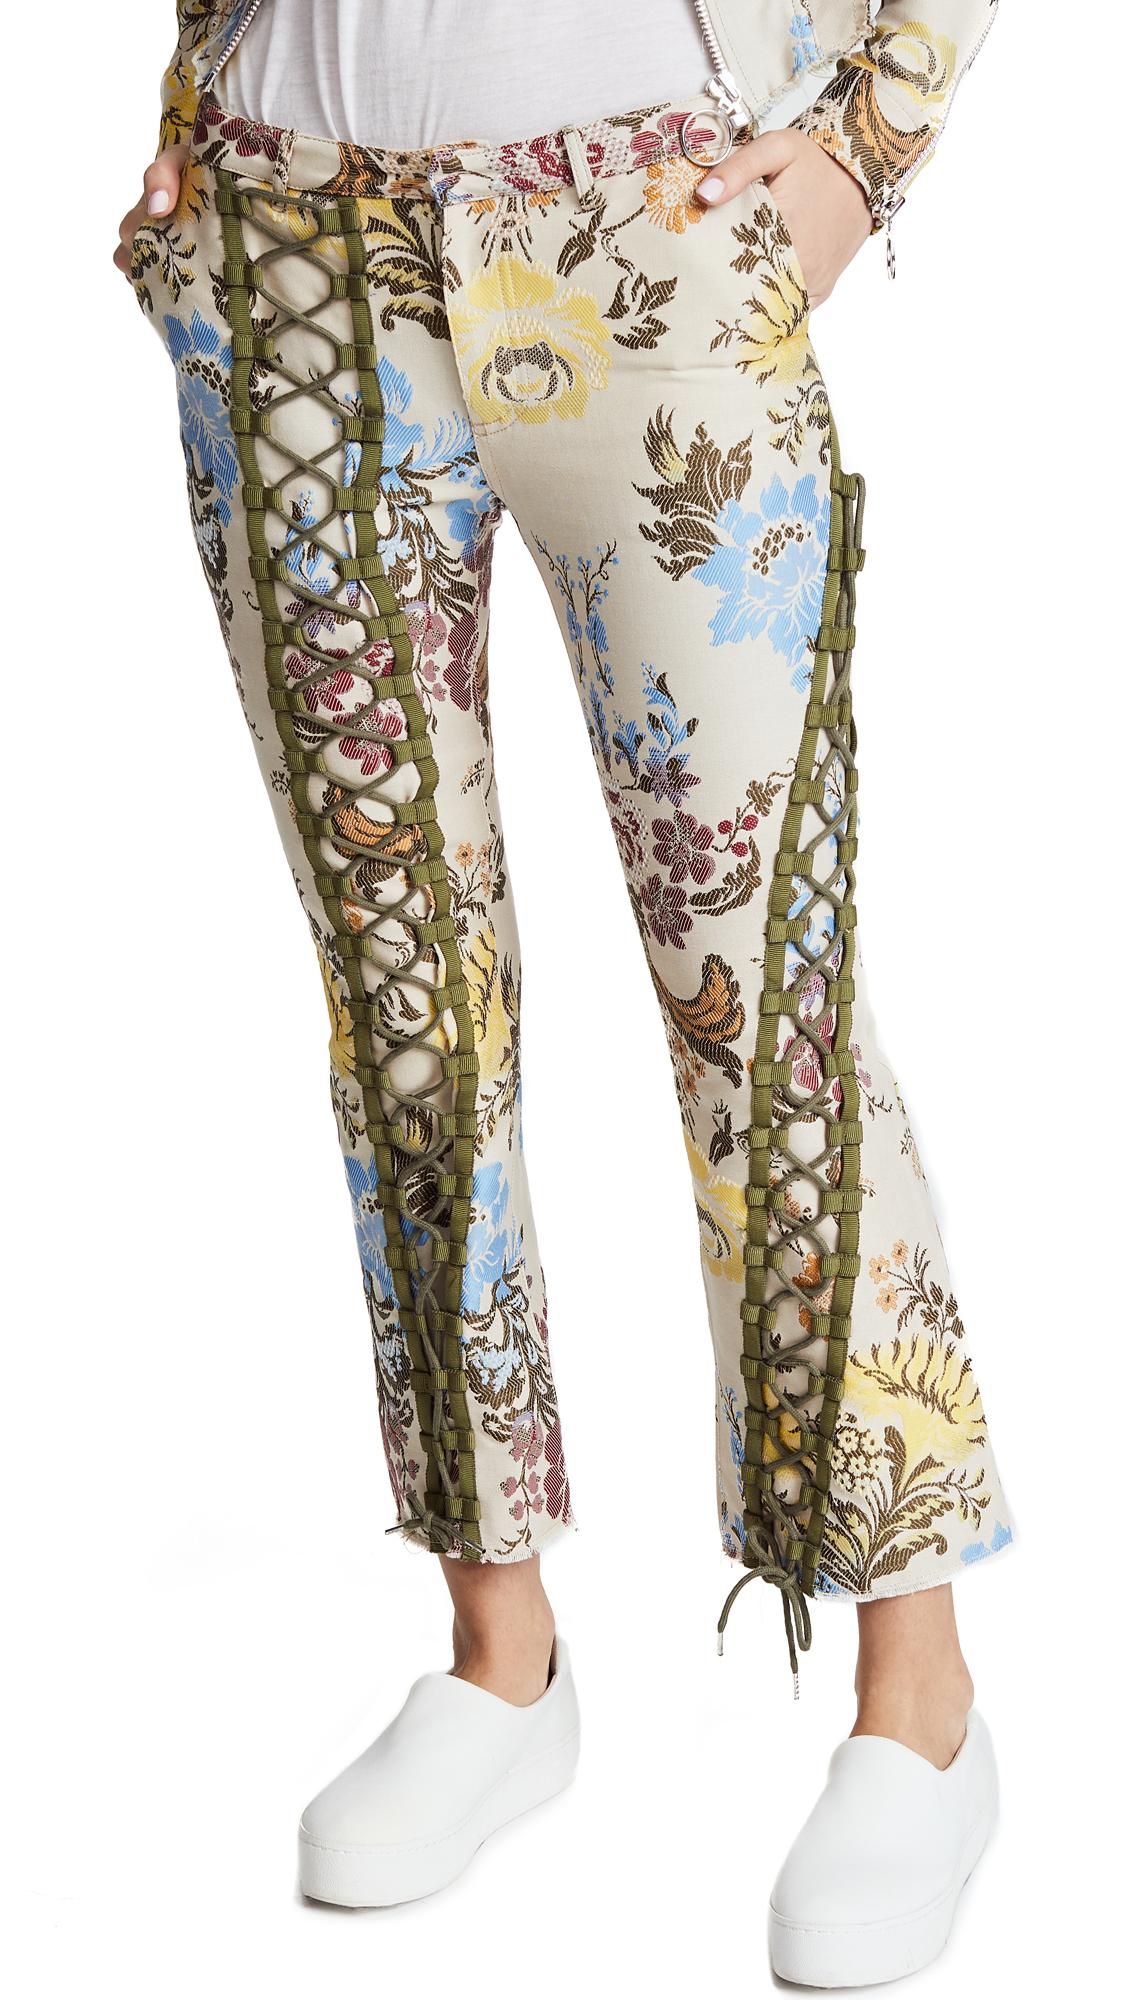 Marques Almeida Lace Up Trousers In Cream/Multi